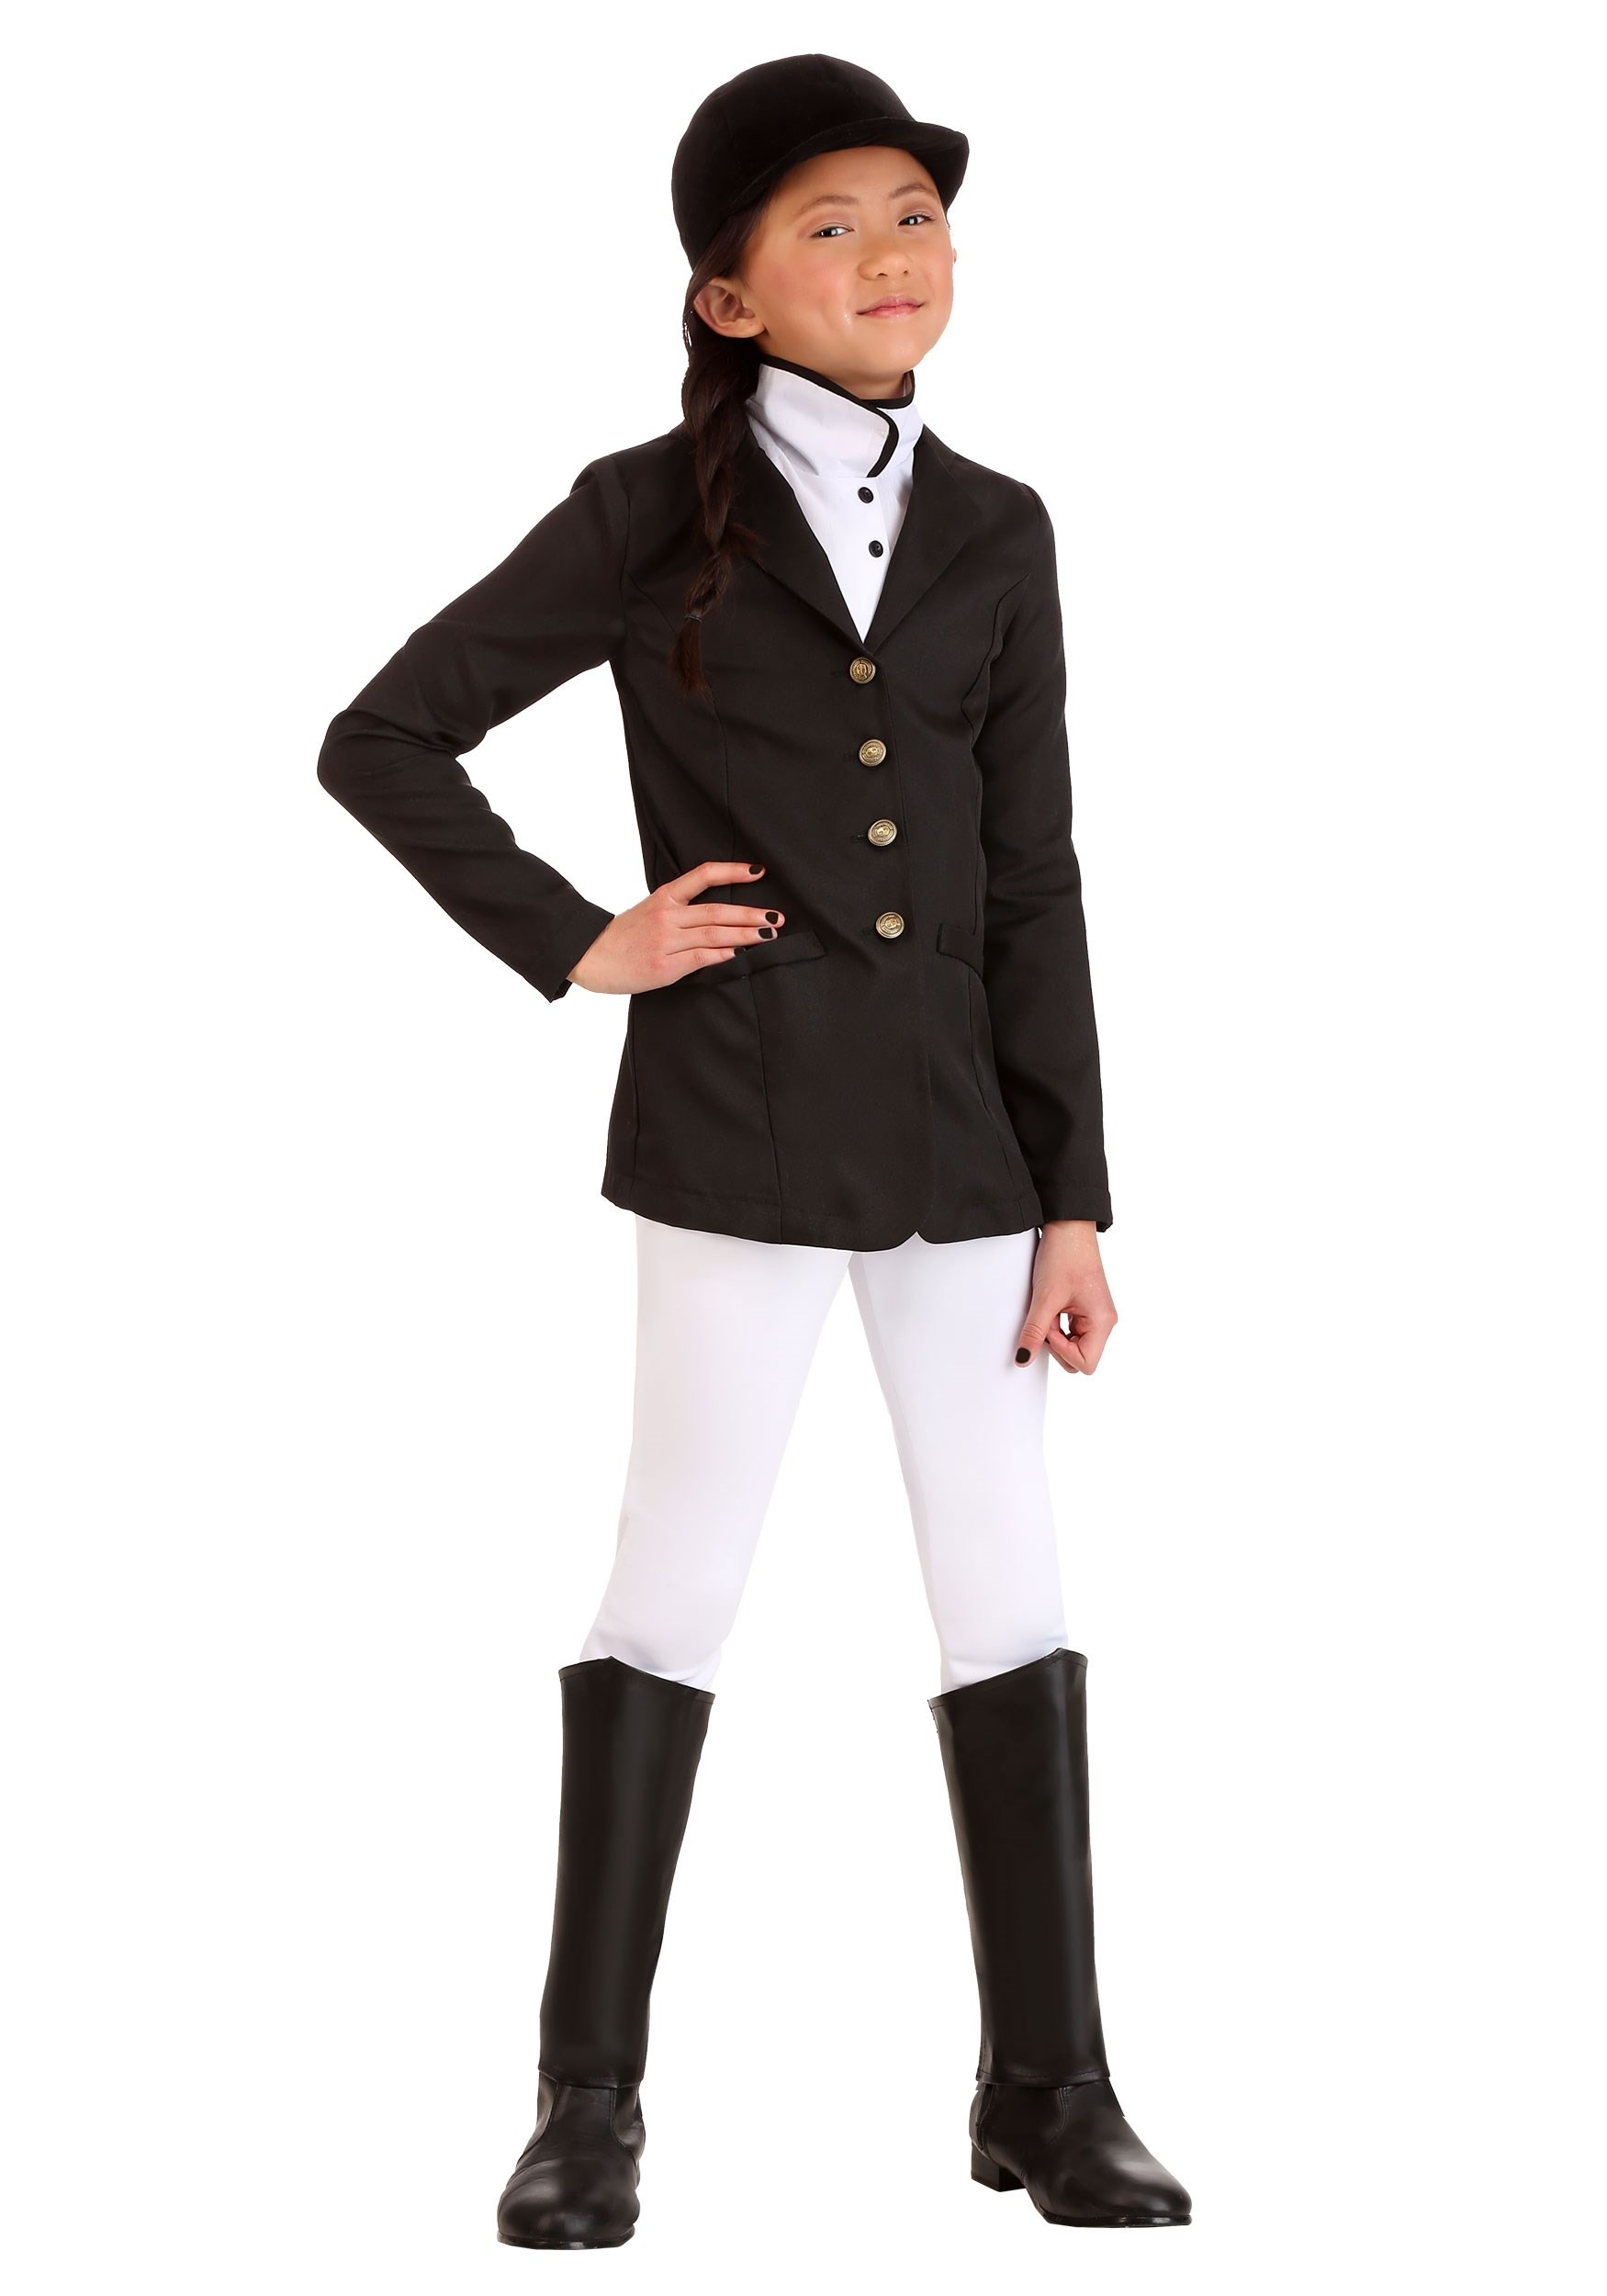 Girls Equestrian Costume Jockey Kids